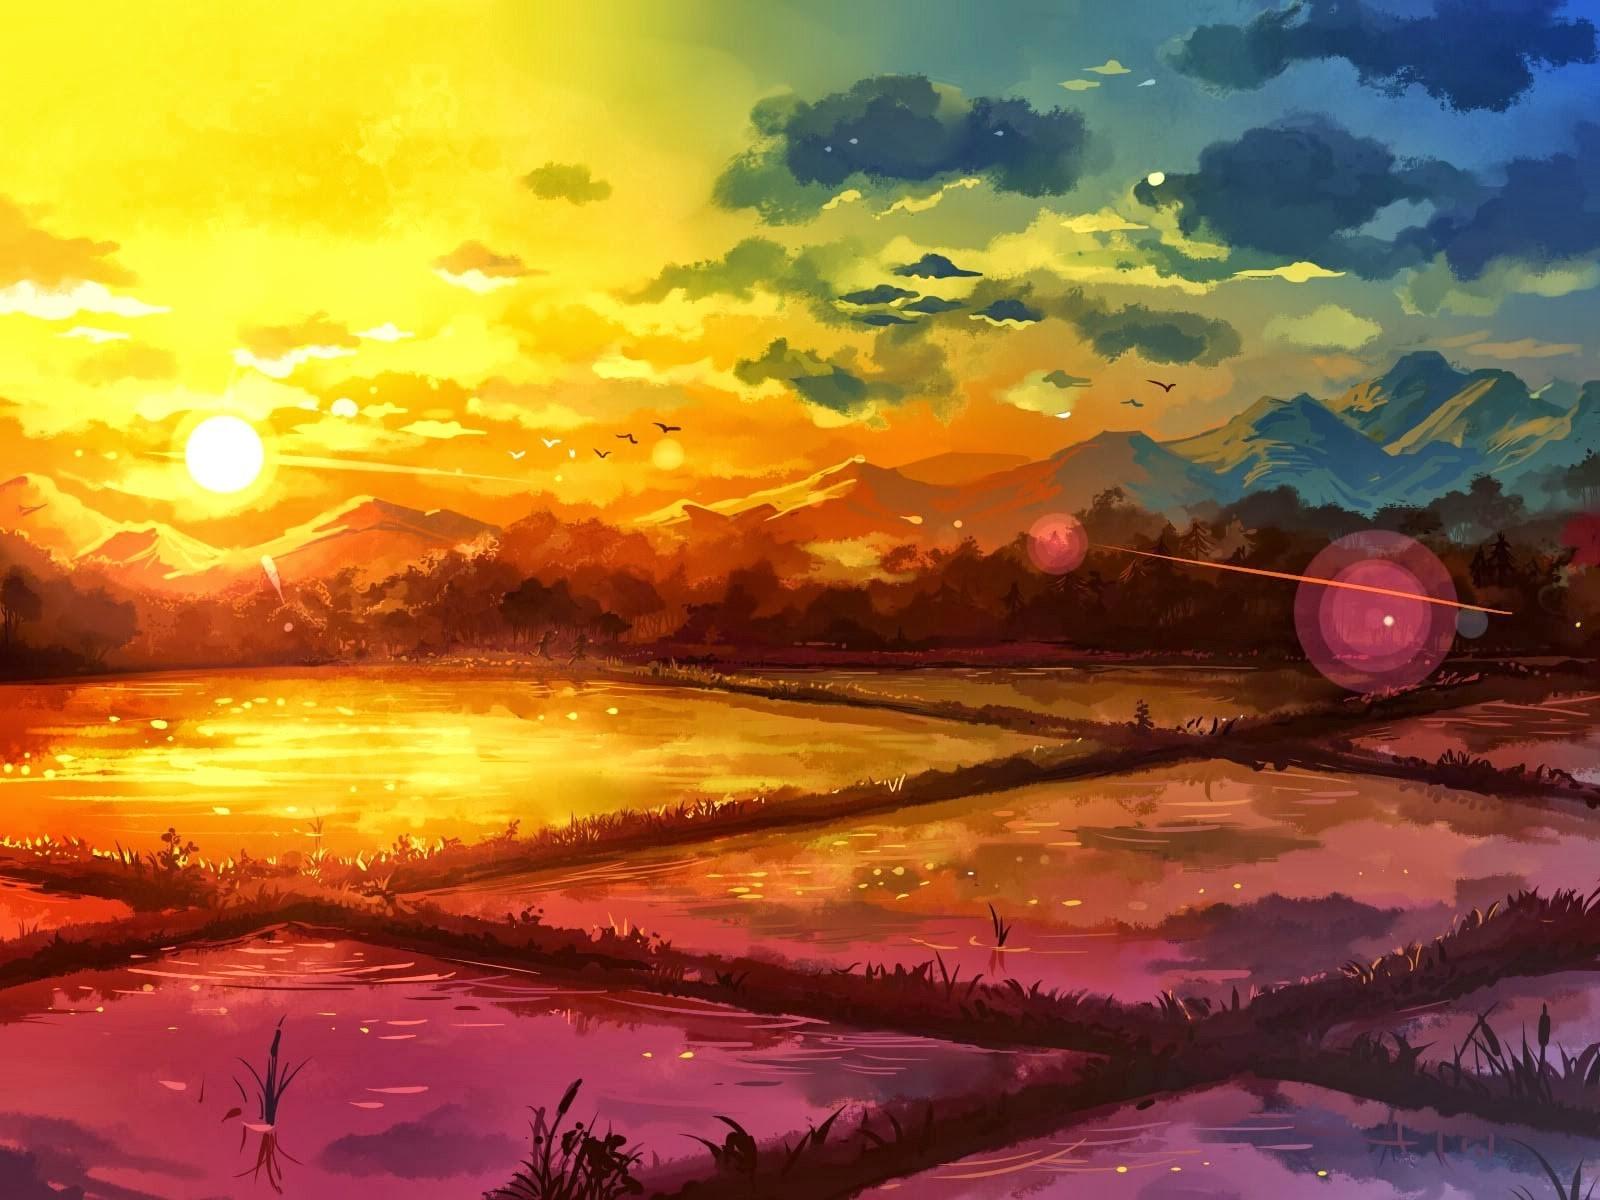 Masaustu Gunes Isigi Boyama Illustrasyon Fantezi Sanati Gun